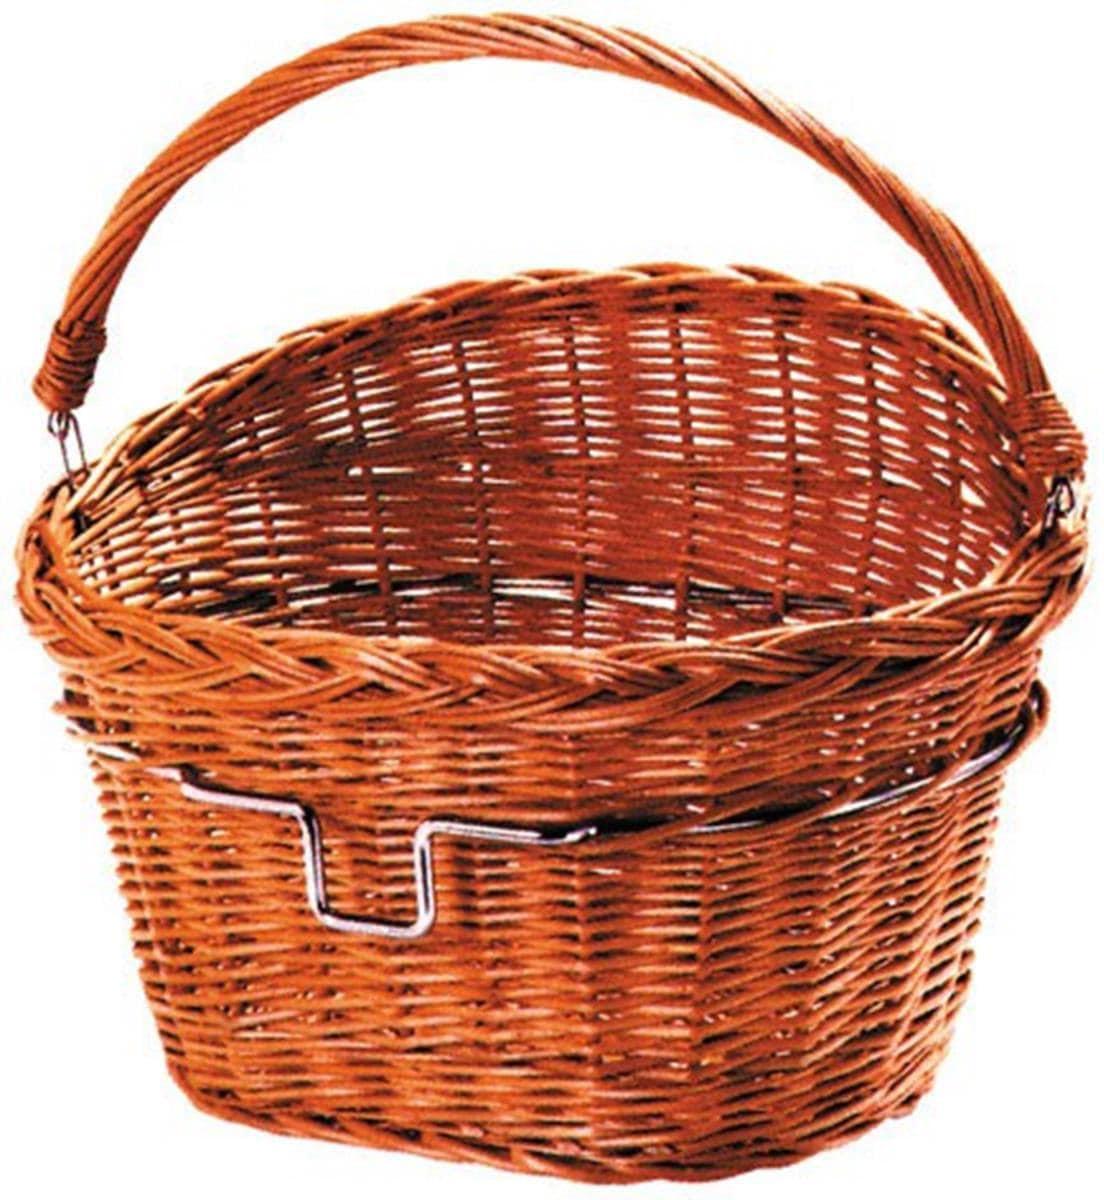 KlickFix Fahrradkorb Vorderradkorb Weidenkorb, braun